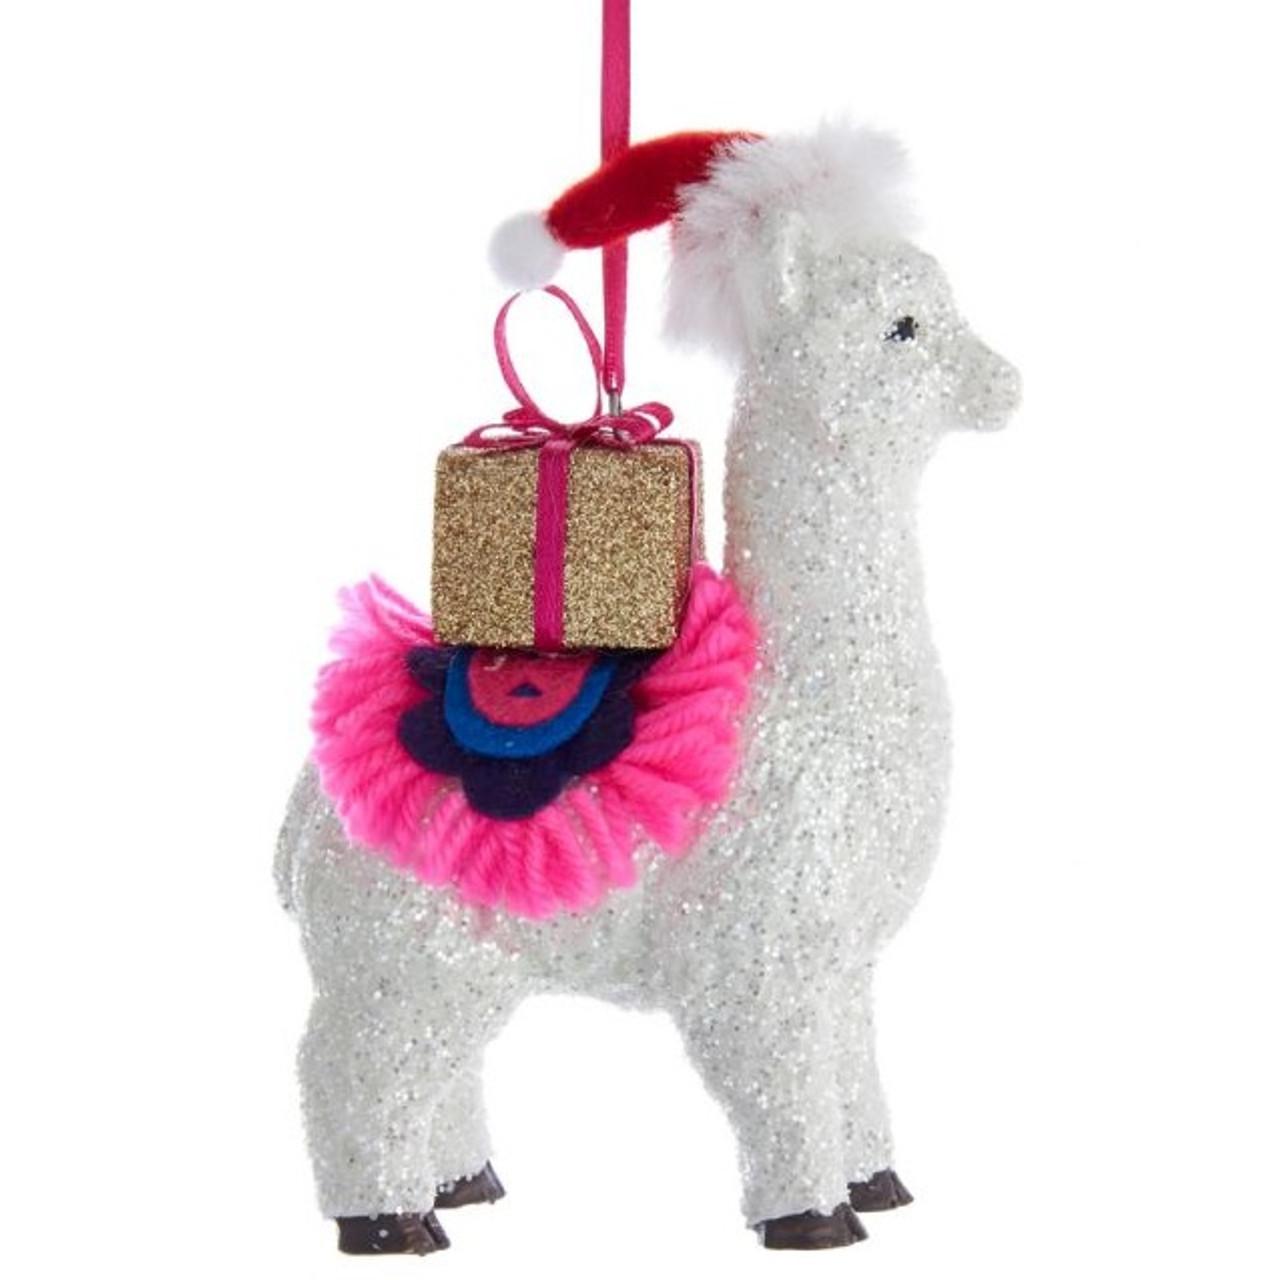 Christmas Llama.Christmas Llama Ornament